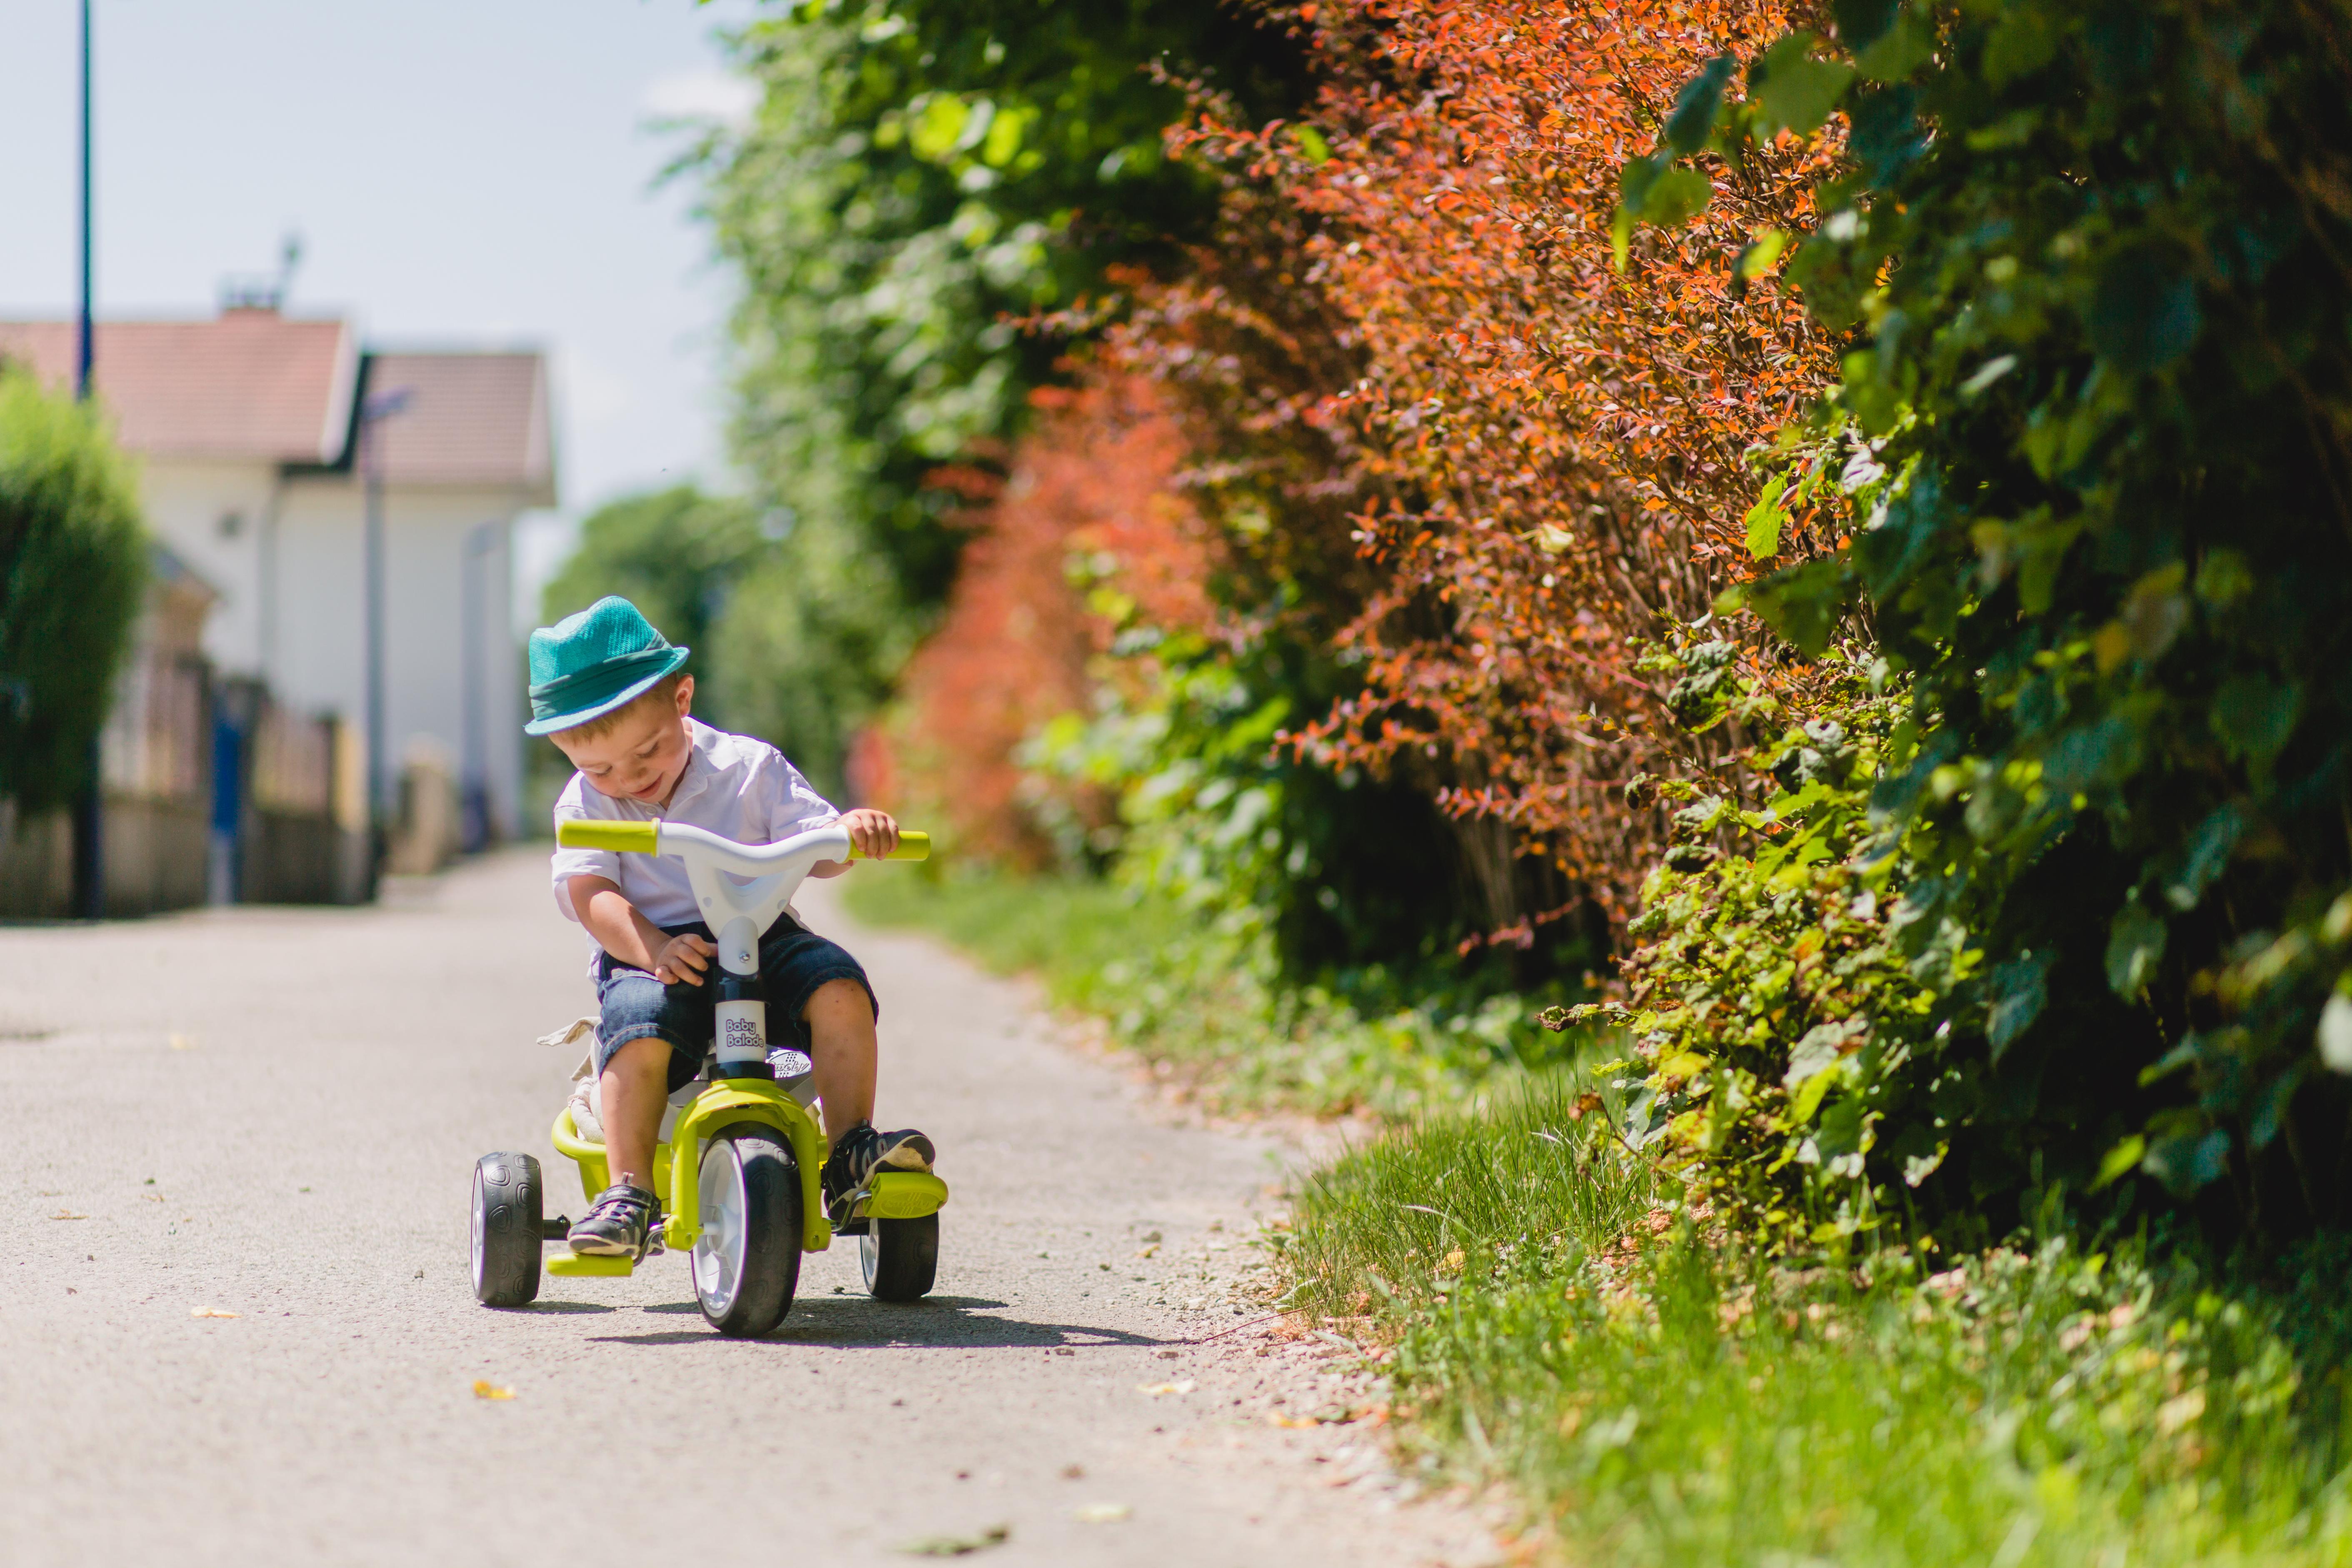 Triciclo Baby Balade 2